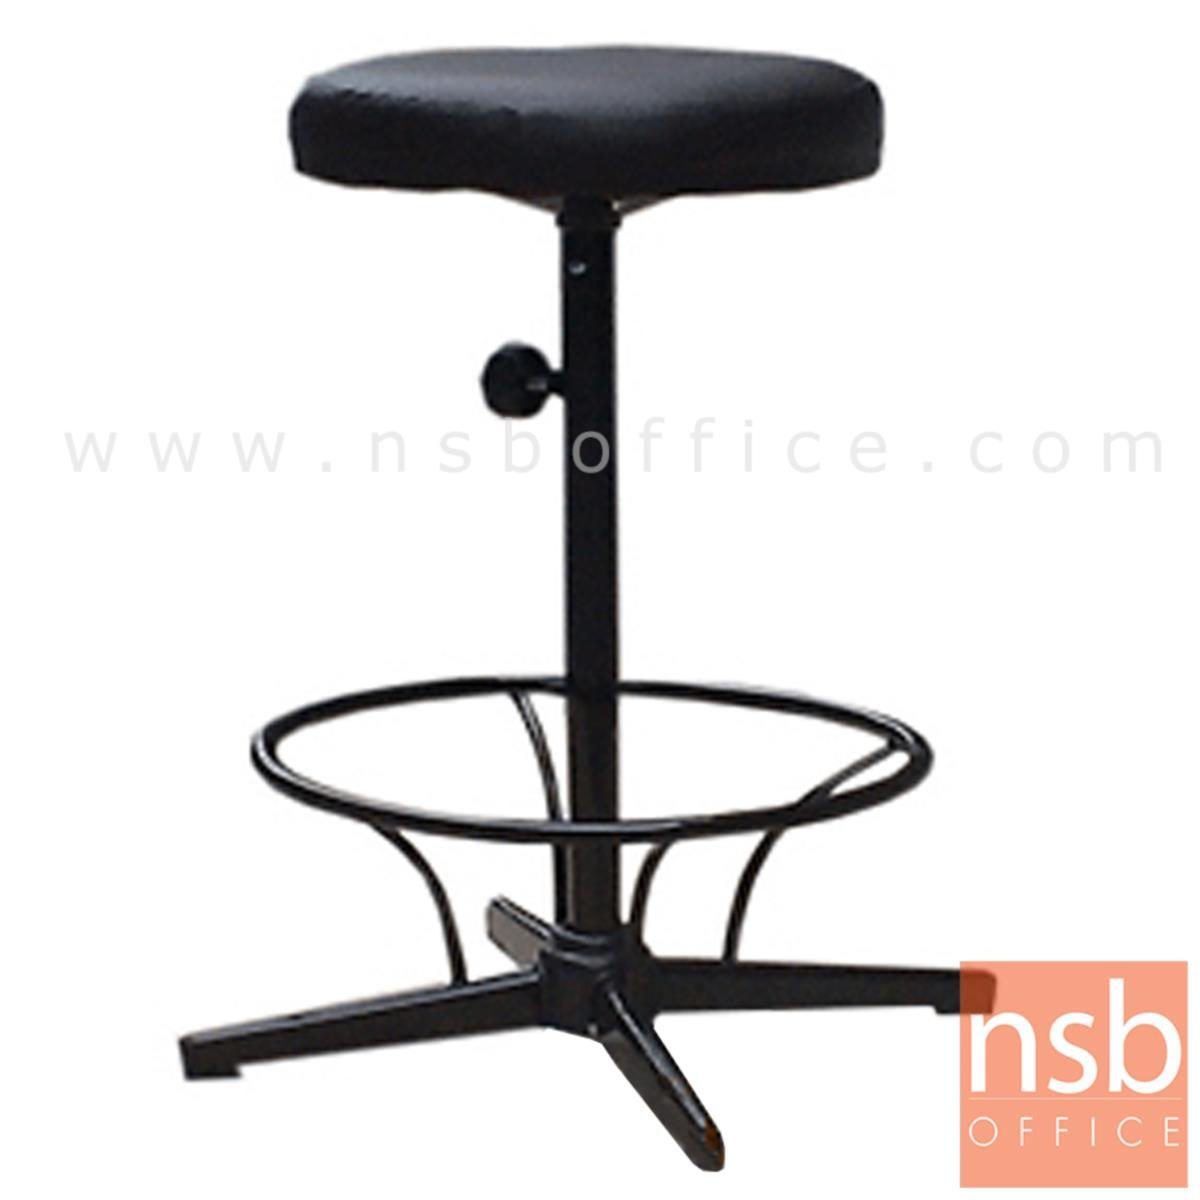 B09A071:เก้าอี้บาร์สตูลที่นั่งกลม รุ่น Keva (เคว่า)  ขาเหล็กพ่นดำ 4 แฉก